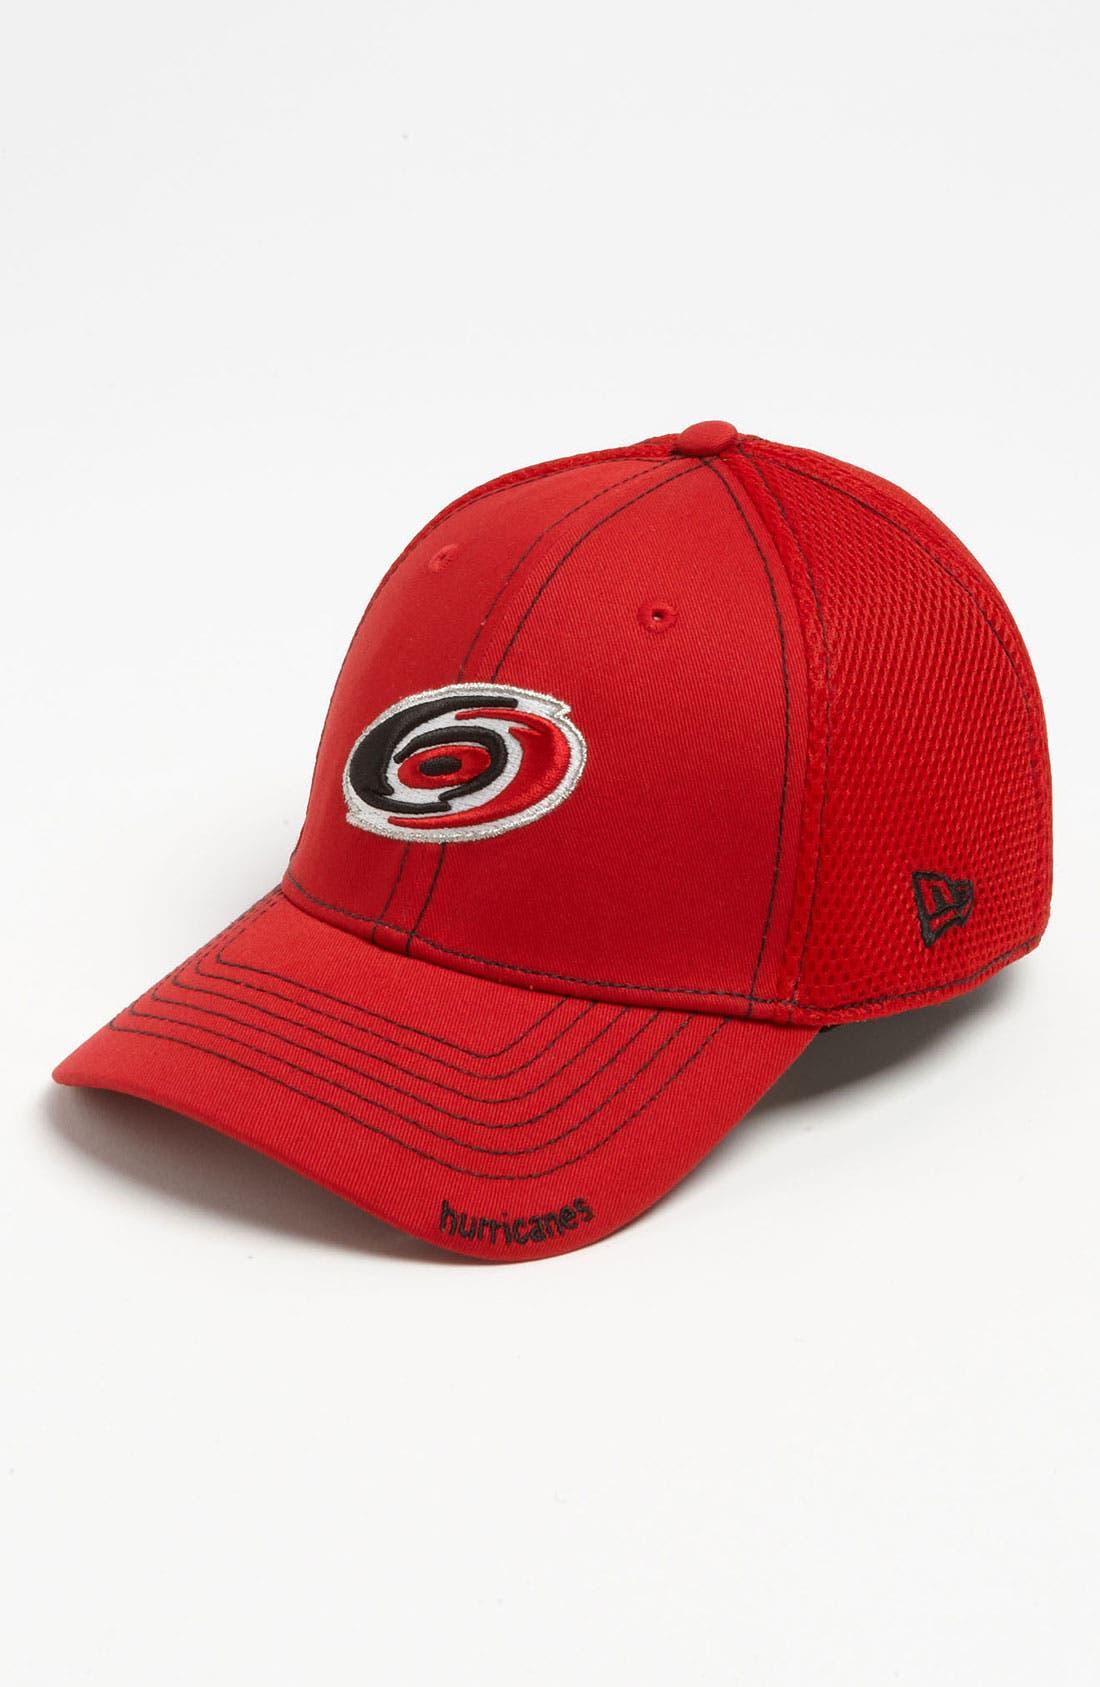 Alternate Image 1 Selected - New Era Cap 'Neo - Carolina Hurricanes' Baseball Cap